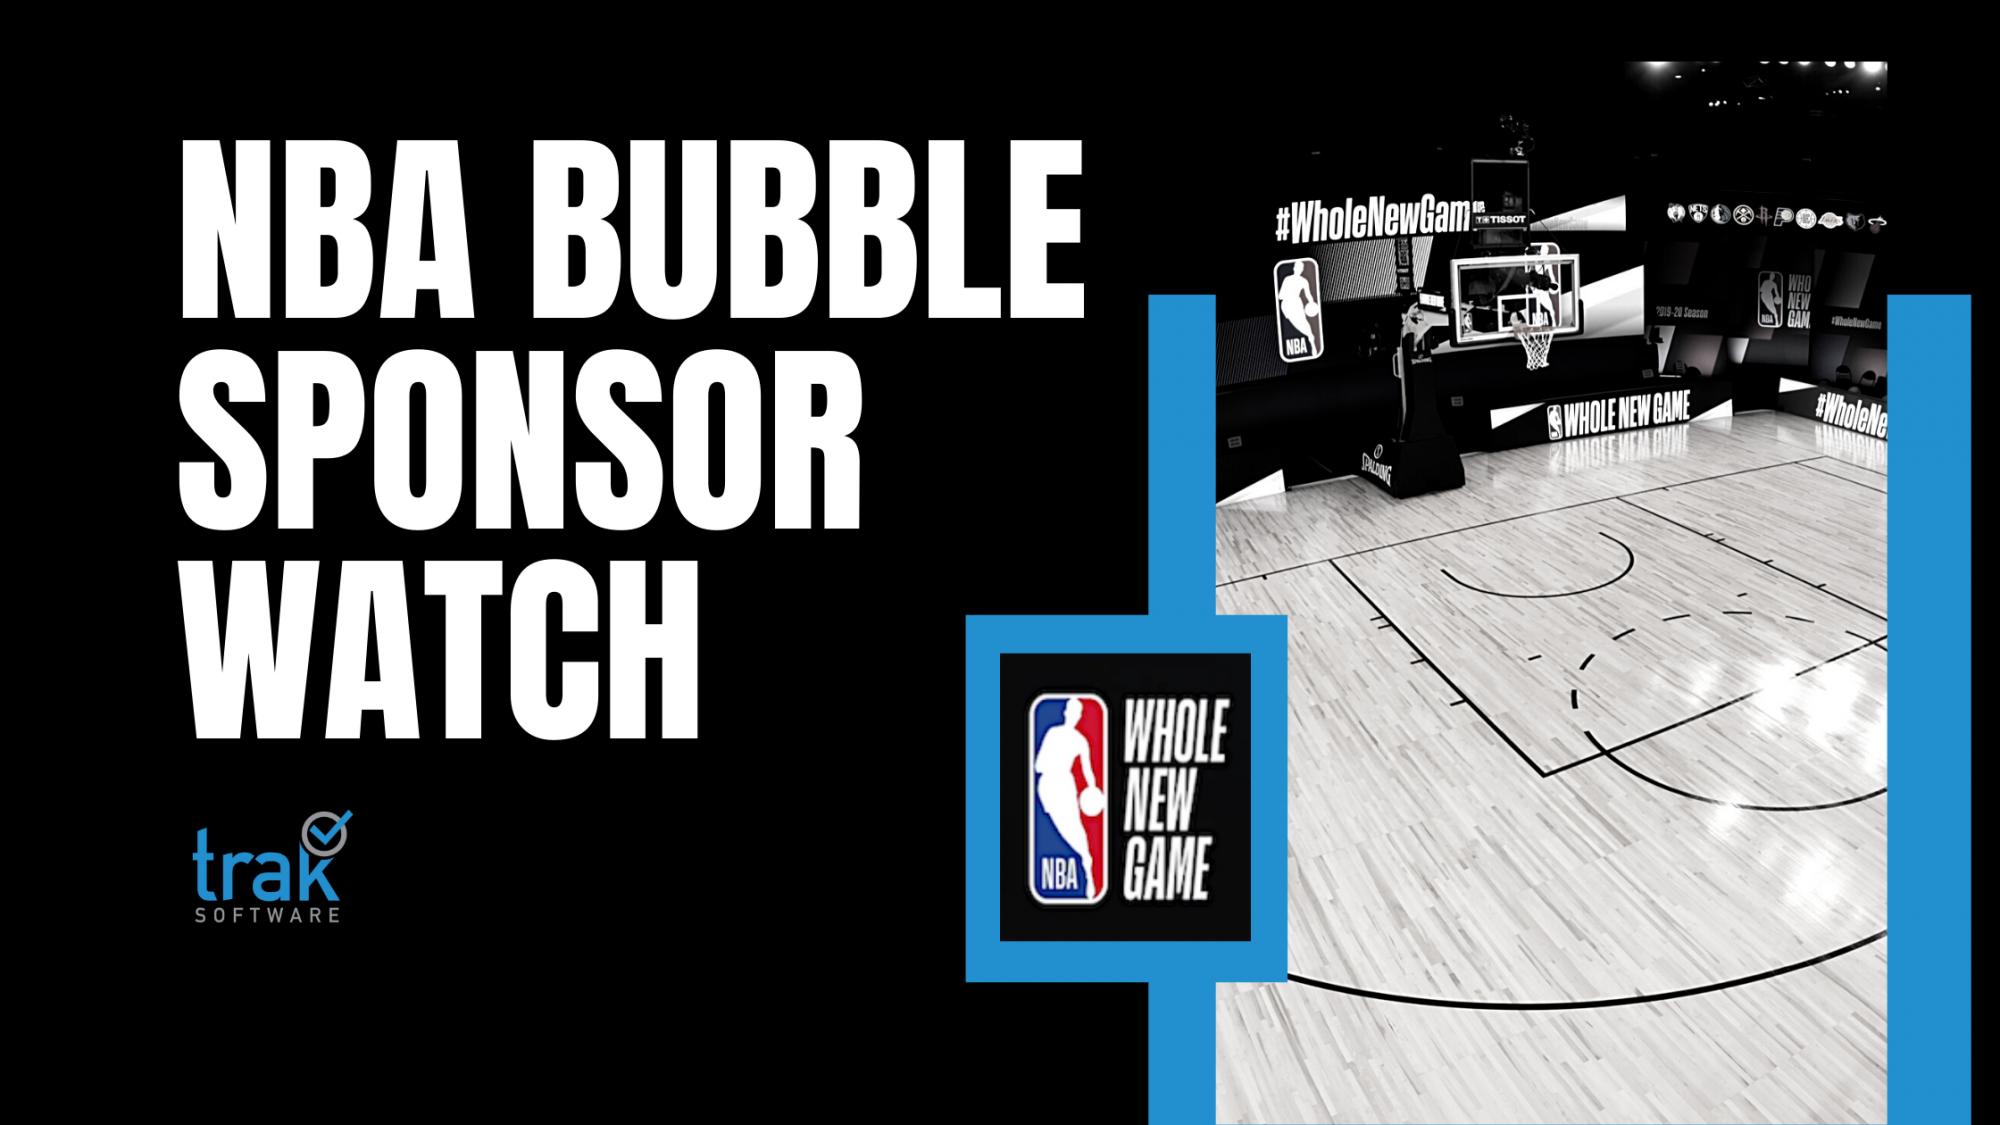 NBA Bubble Sponsor Watch Banner